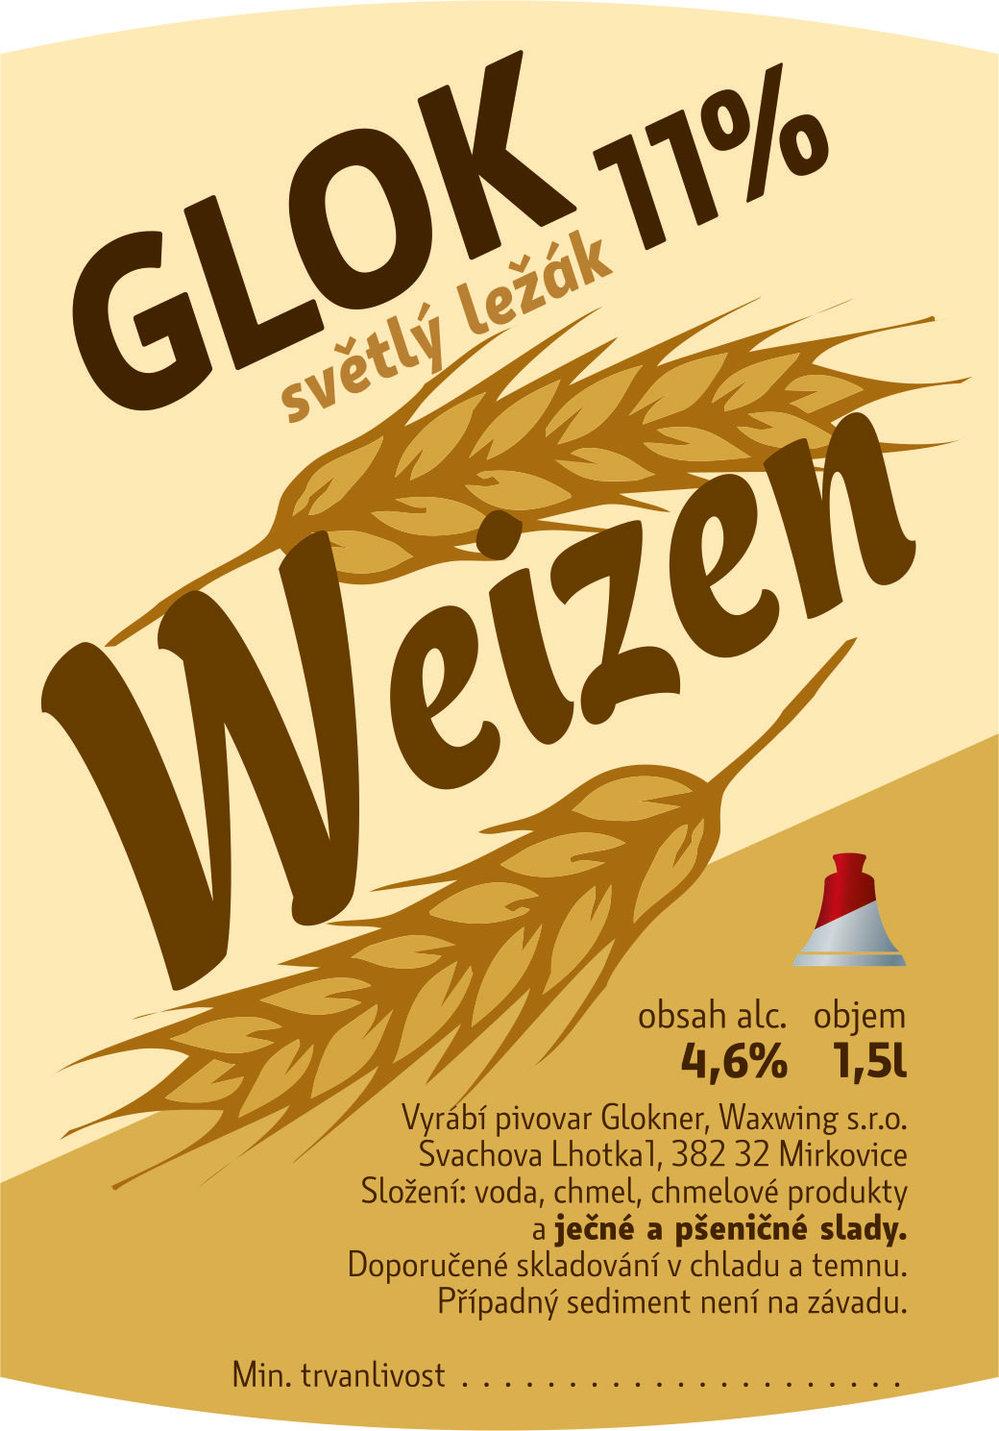 Glok 11 Weizen světlý ležák